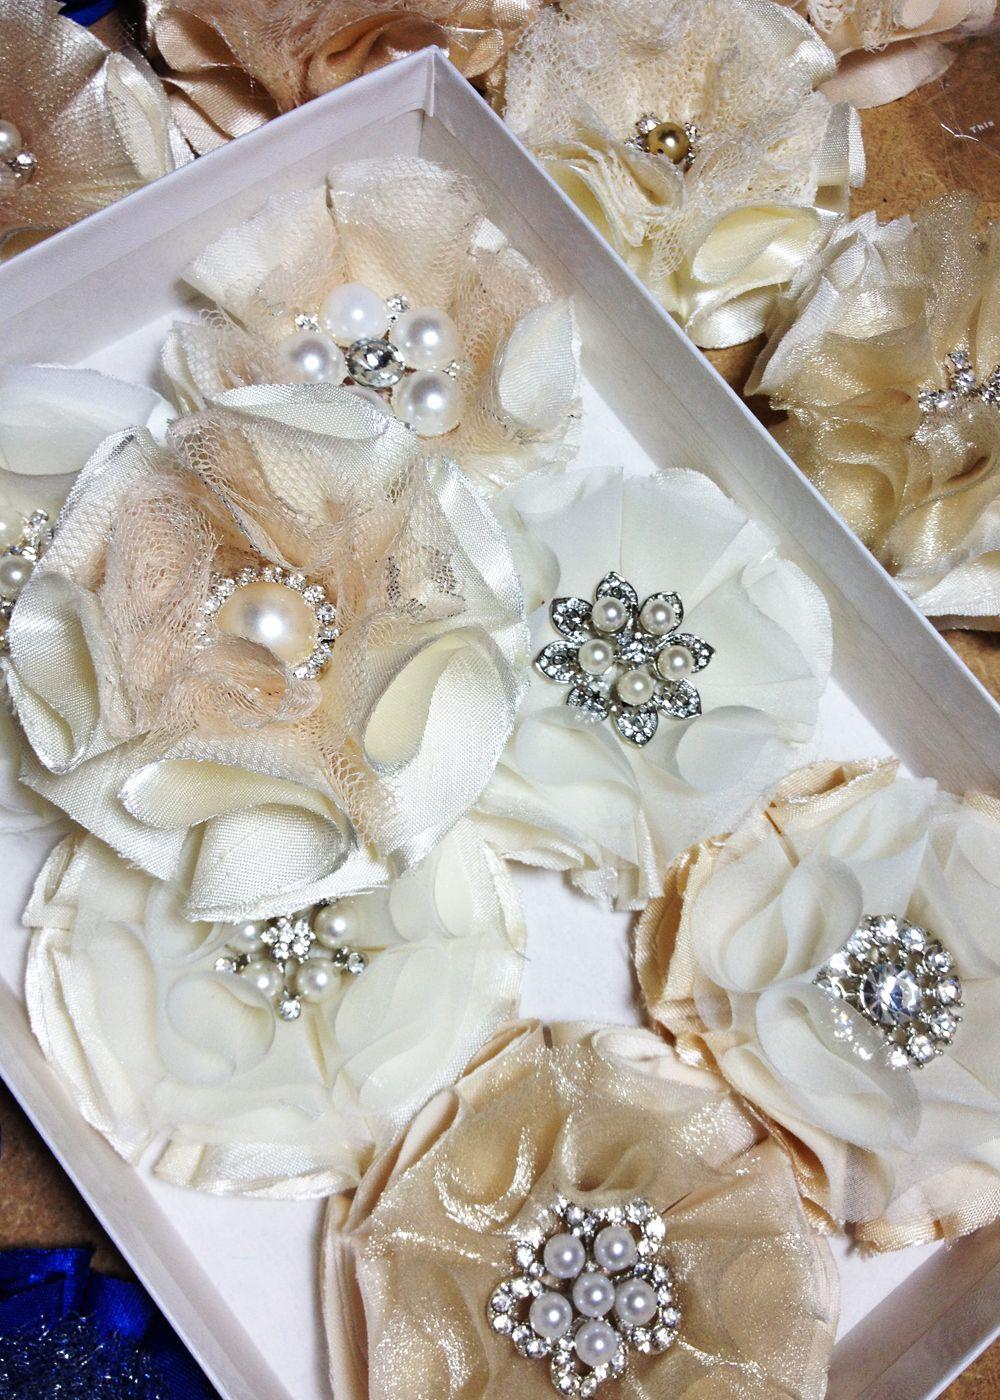 Custom diy flowers pinterest bridal bouquets flowers and fabrics diy bridal bouquet fabric flowers viogemini 4 izmirmasajfo